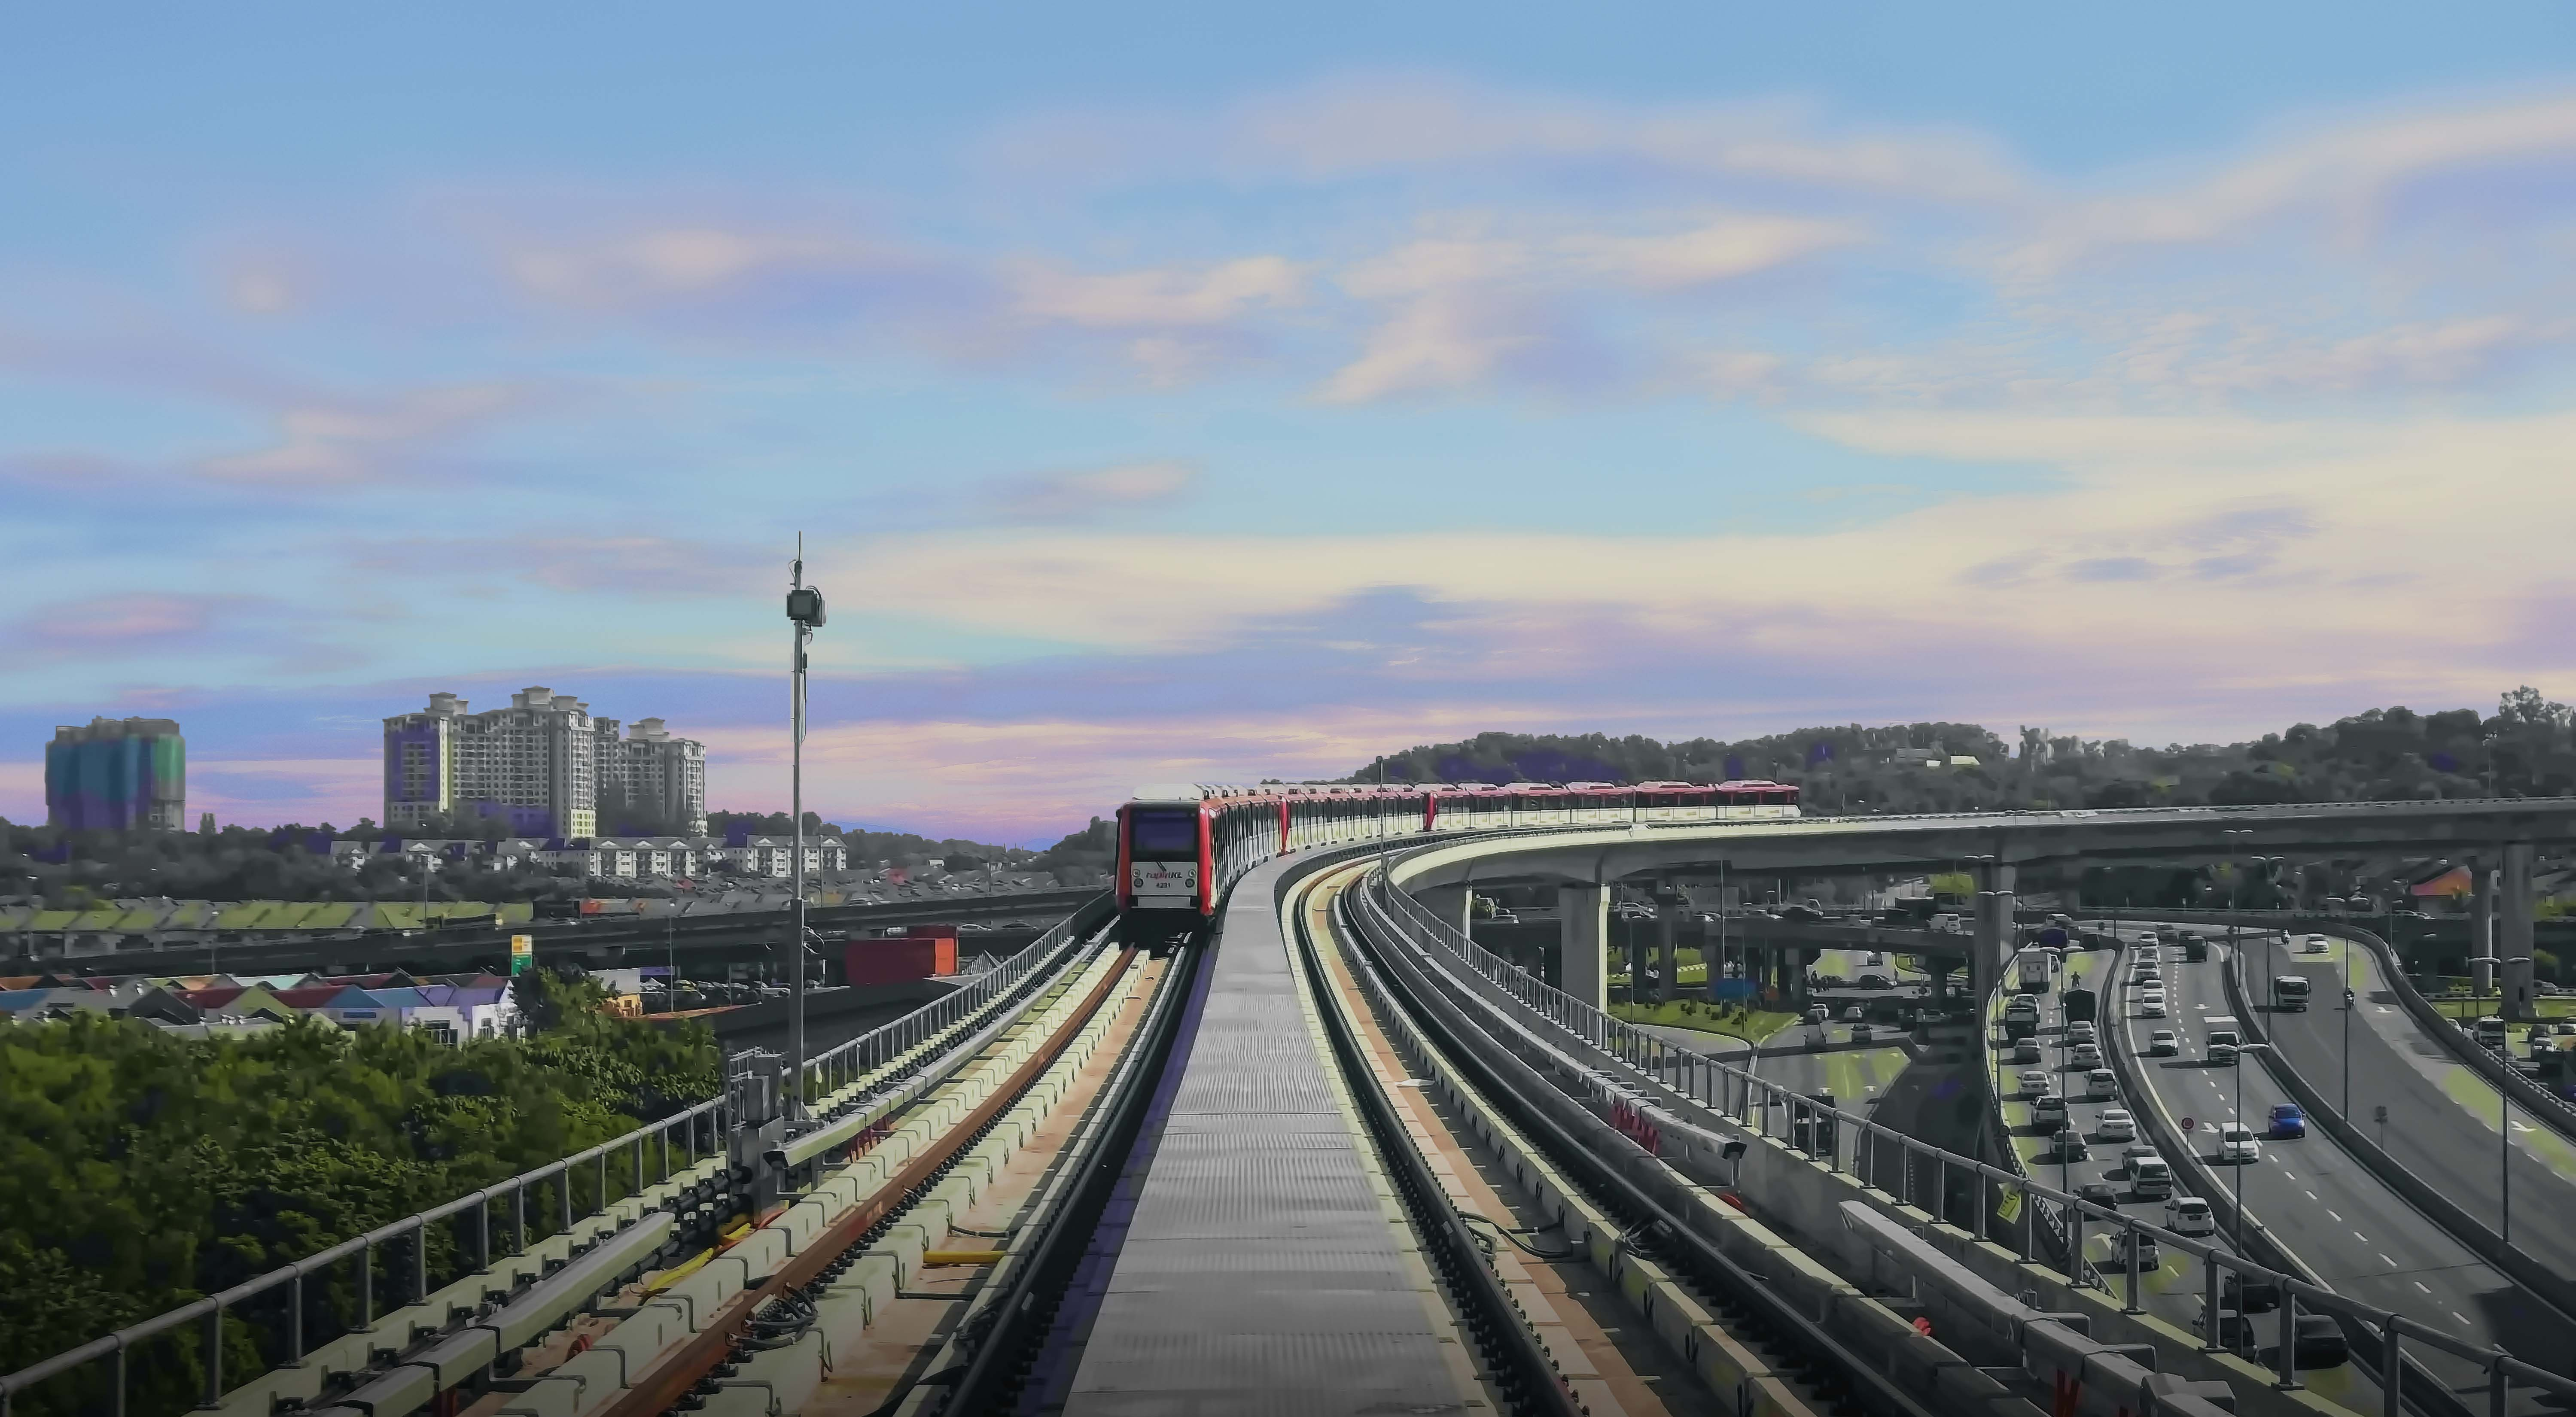 Train-Arriving-300-dpi_1